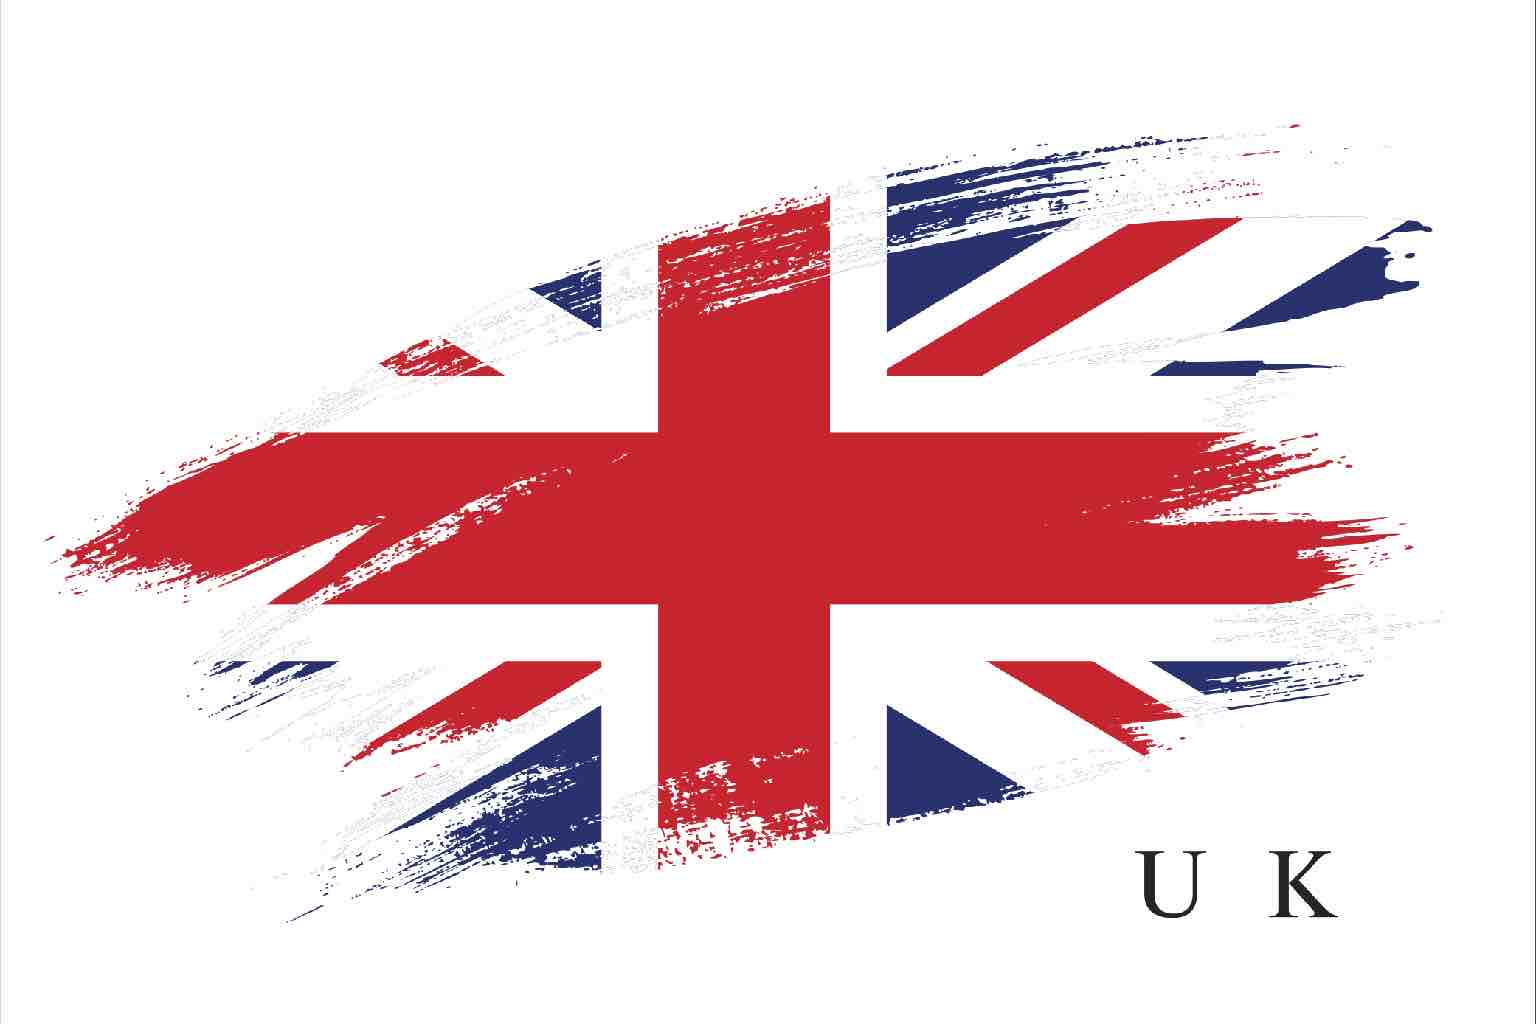 Artistic treatment of UK flag